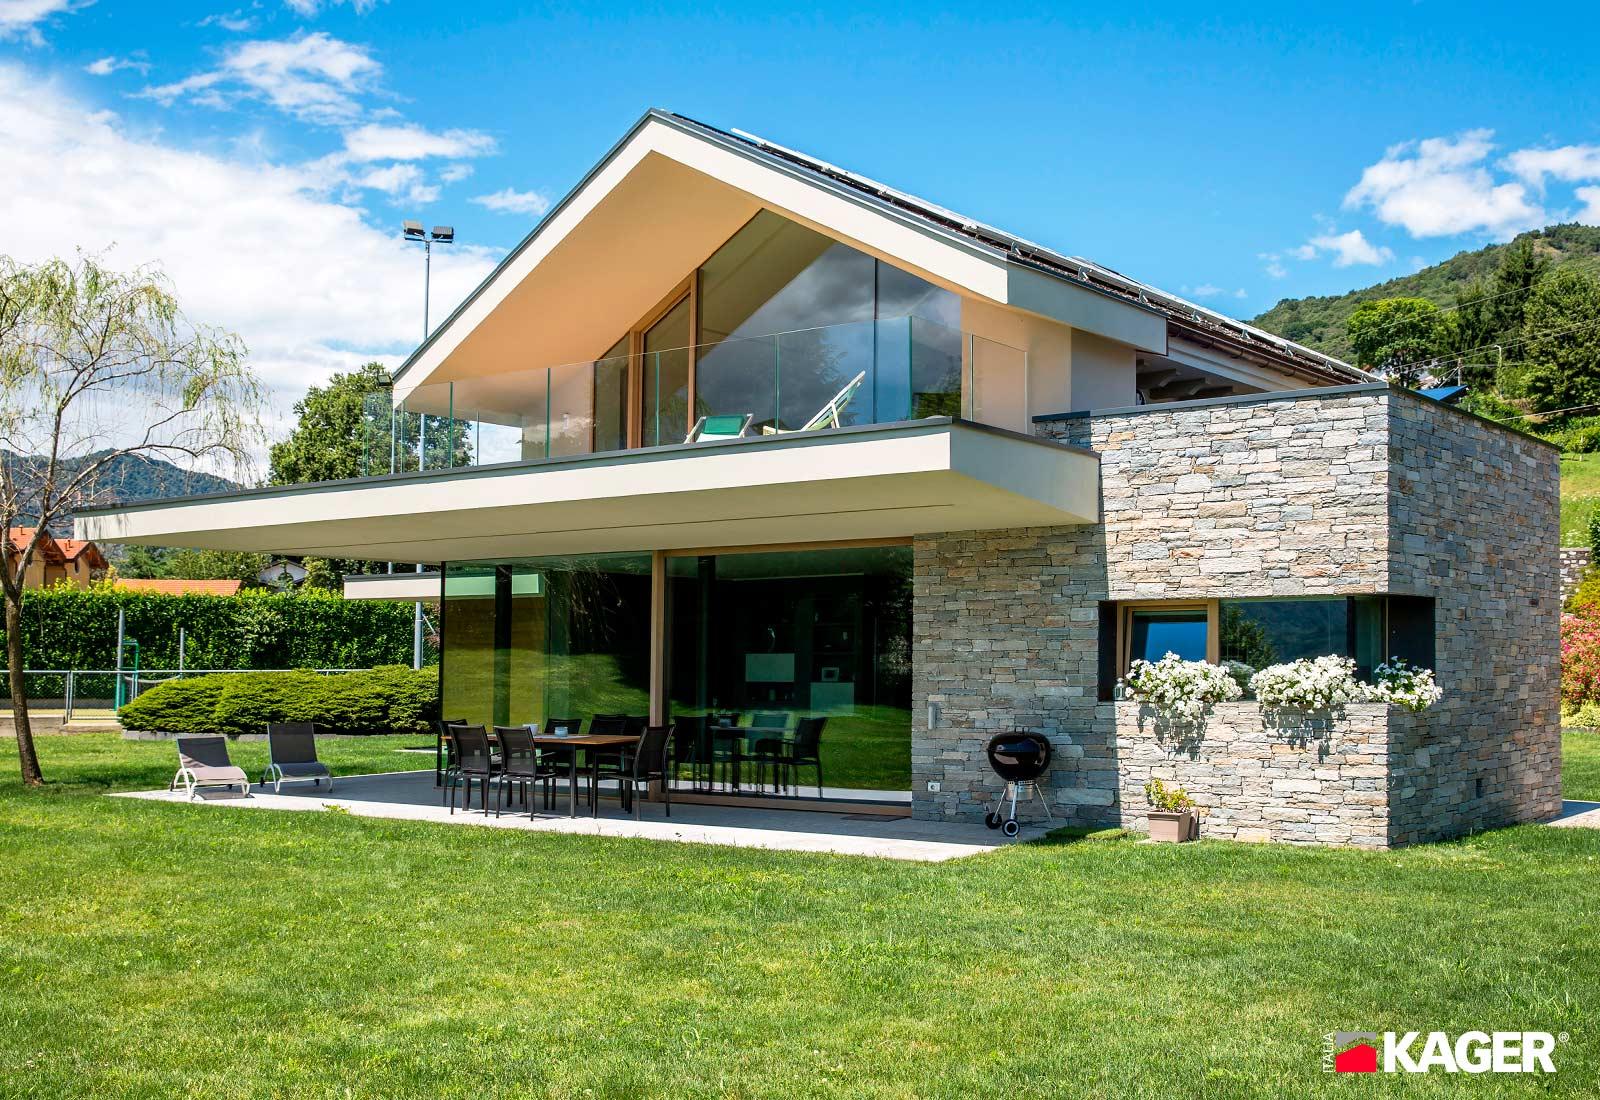 Casa-in-legno-Novara-Kager-Italia-03